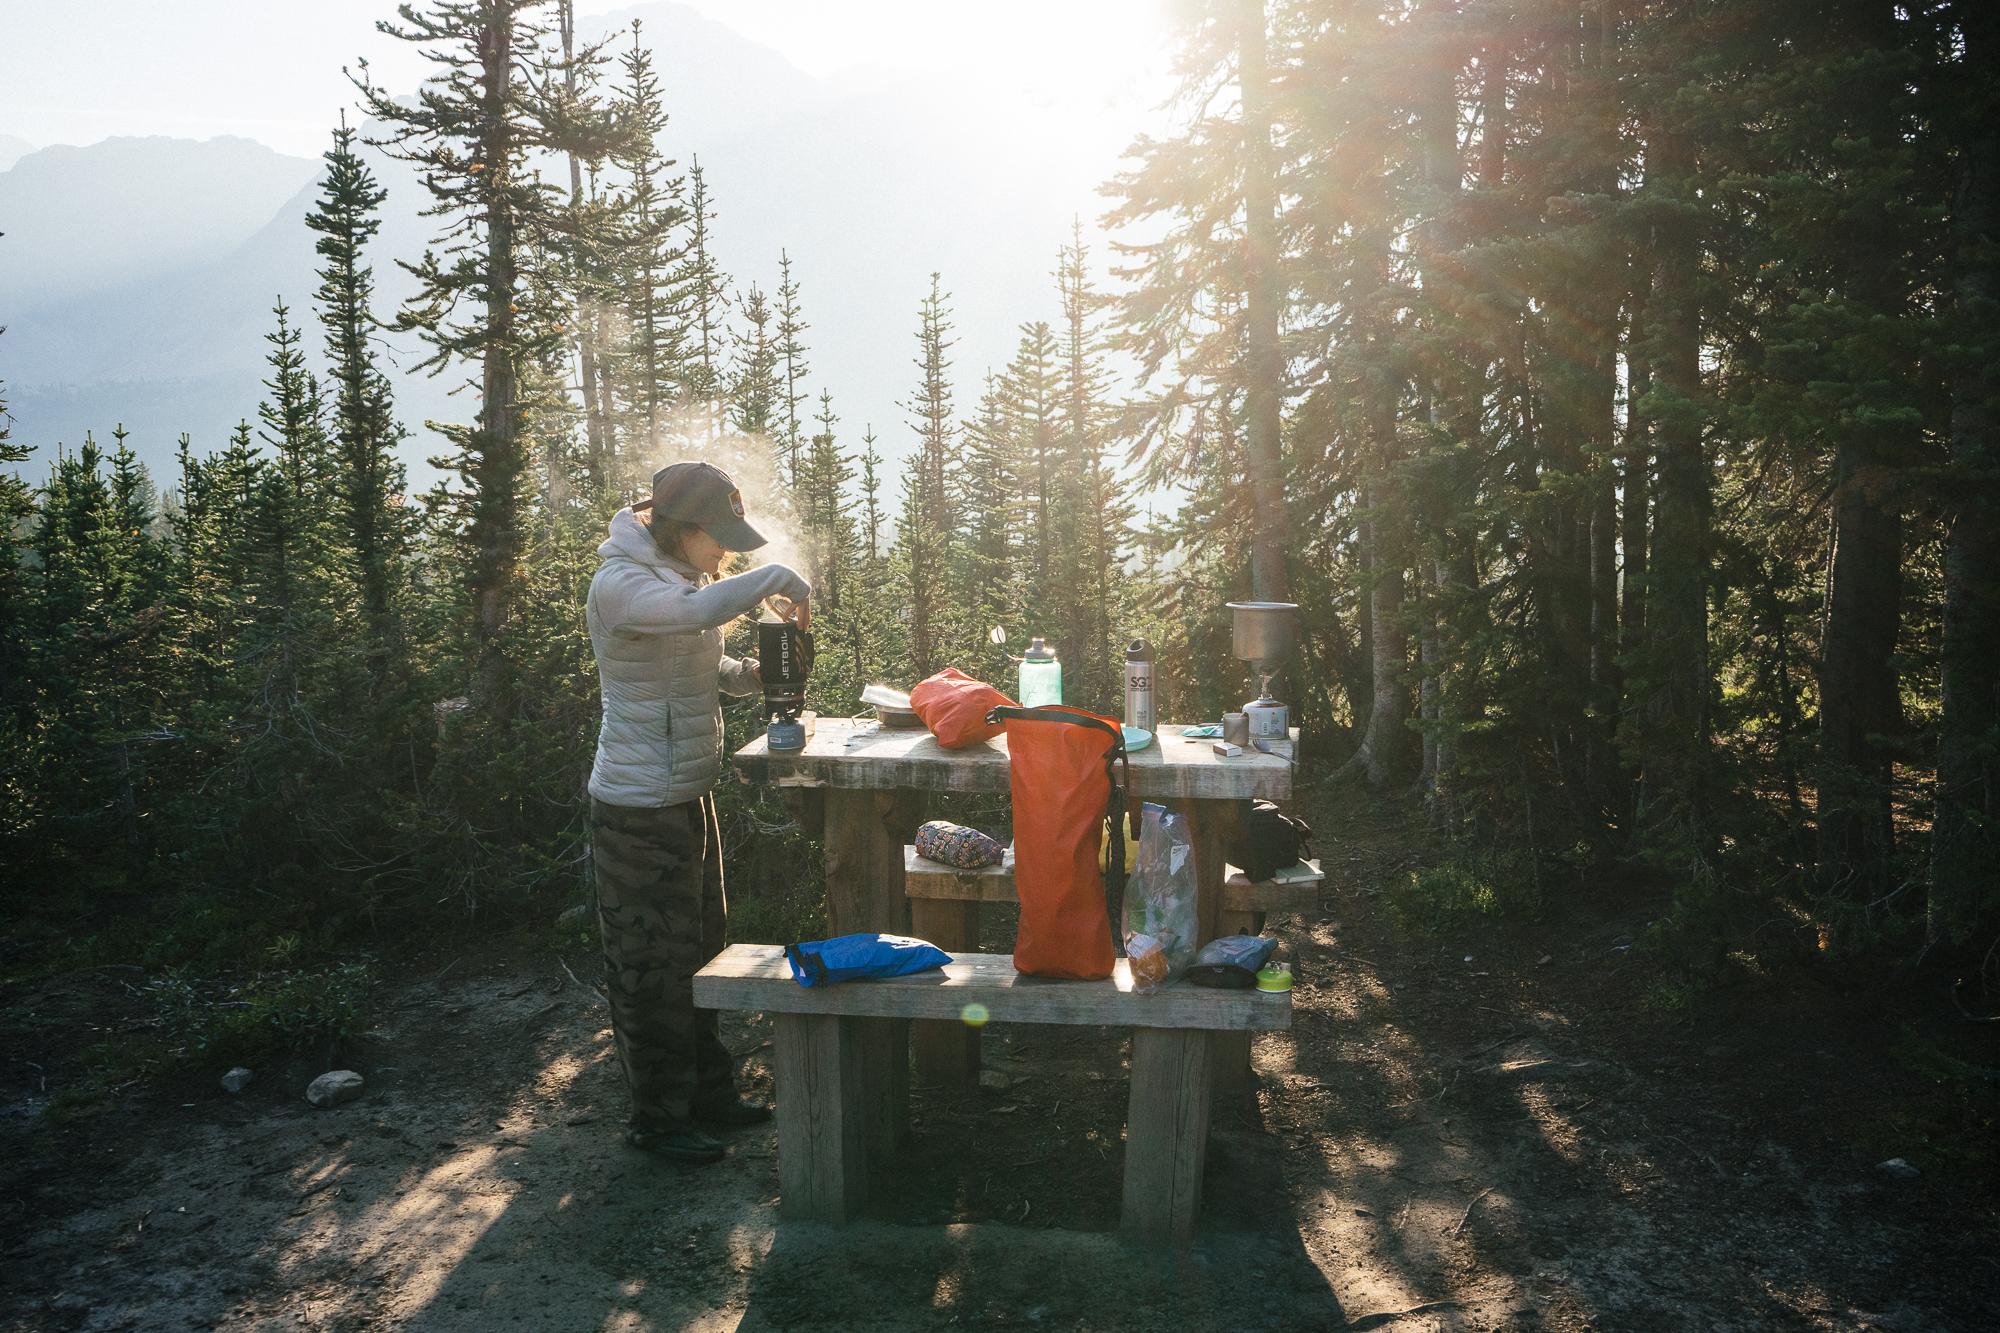 Banff-03578.jpg